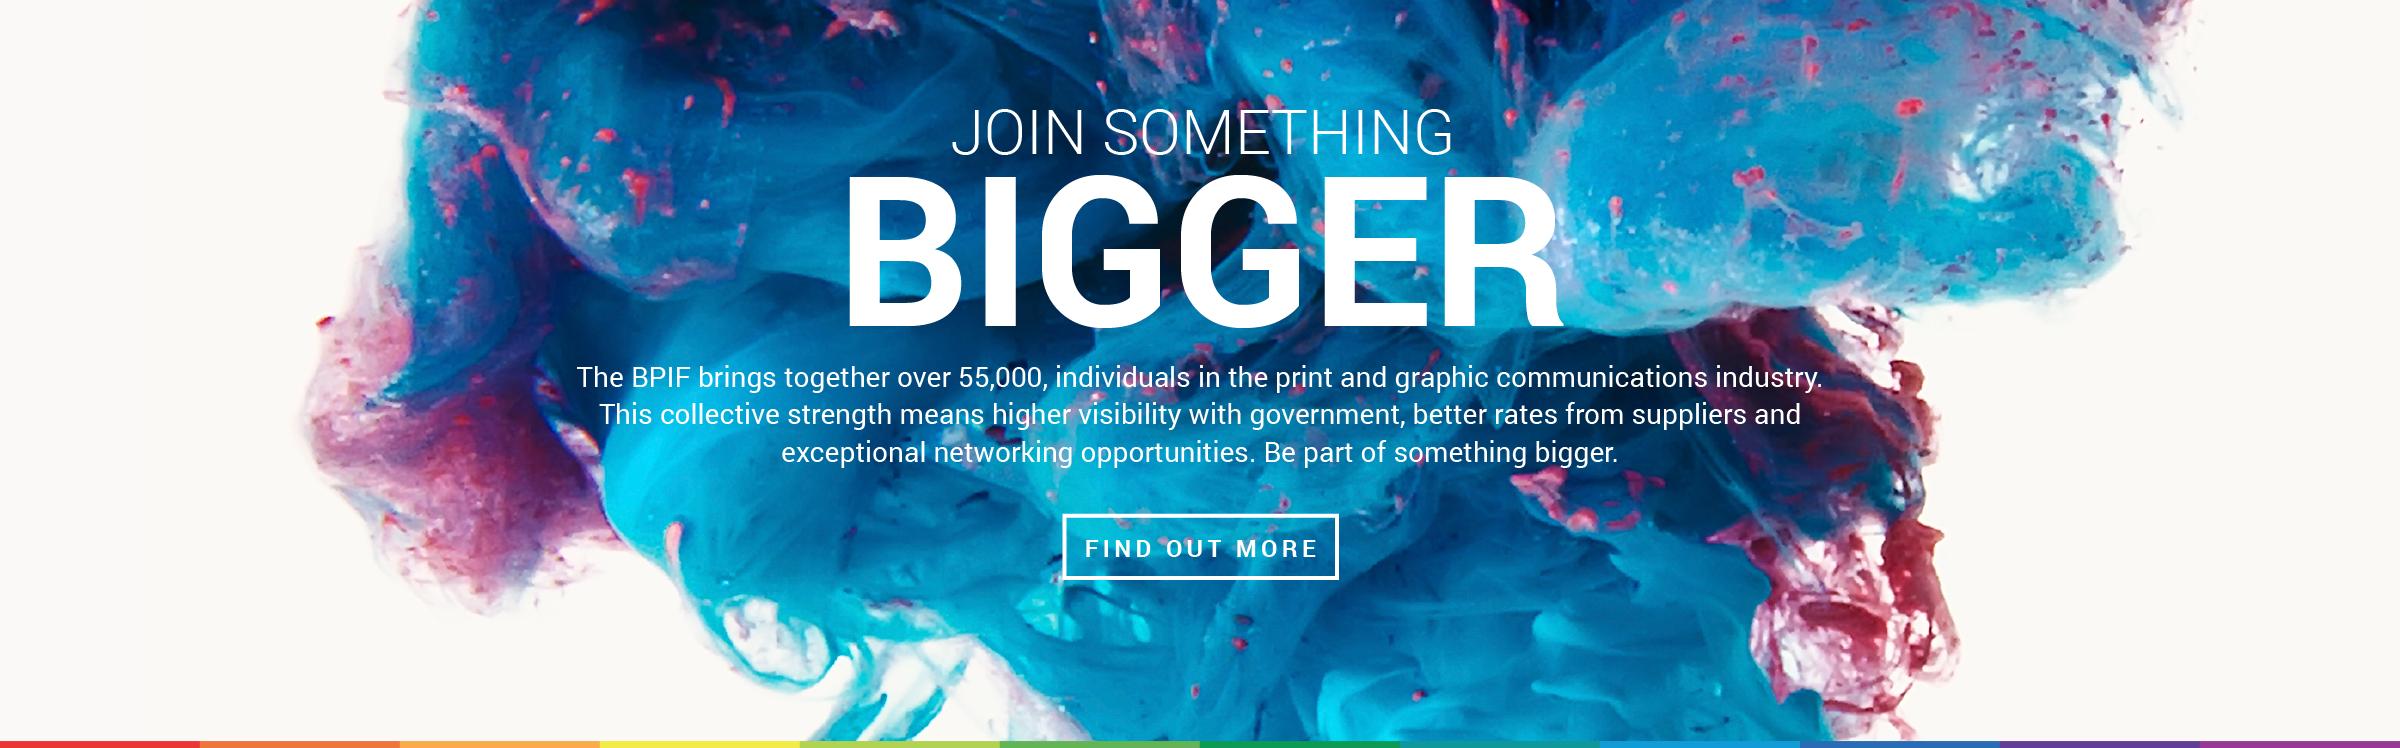 Join Something Bigger